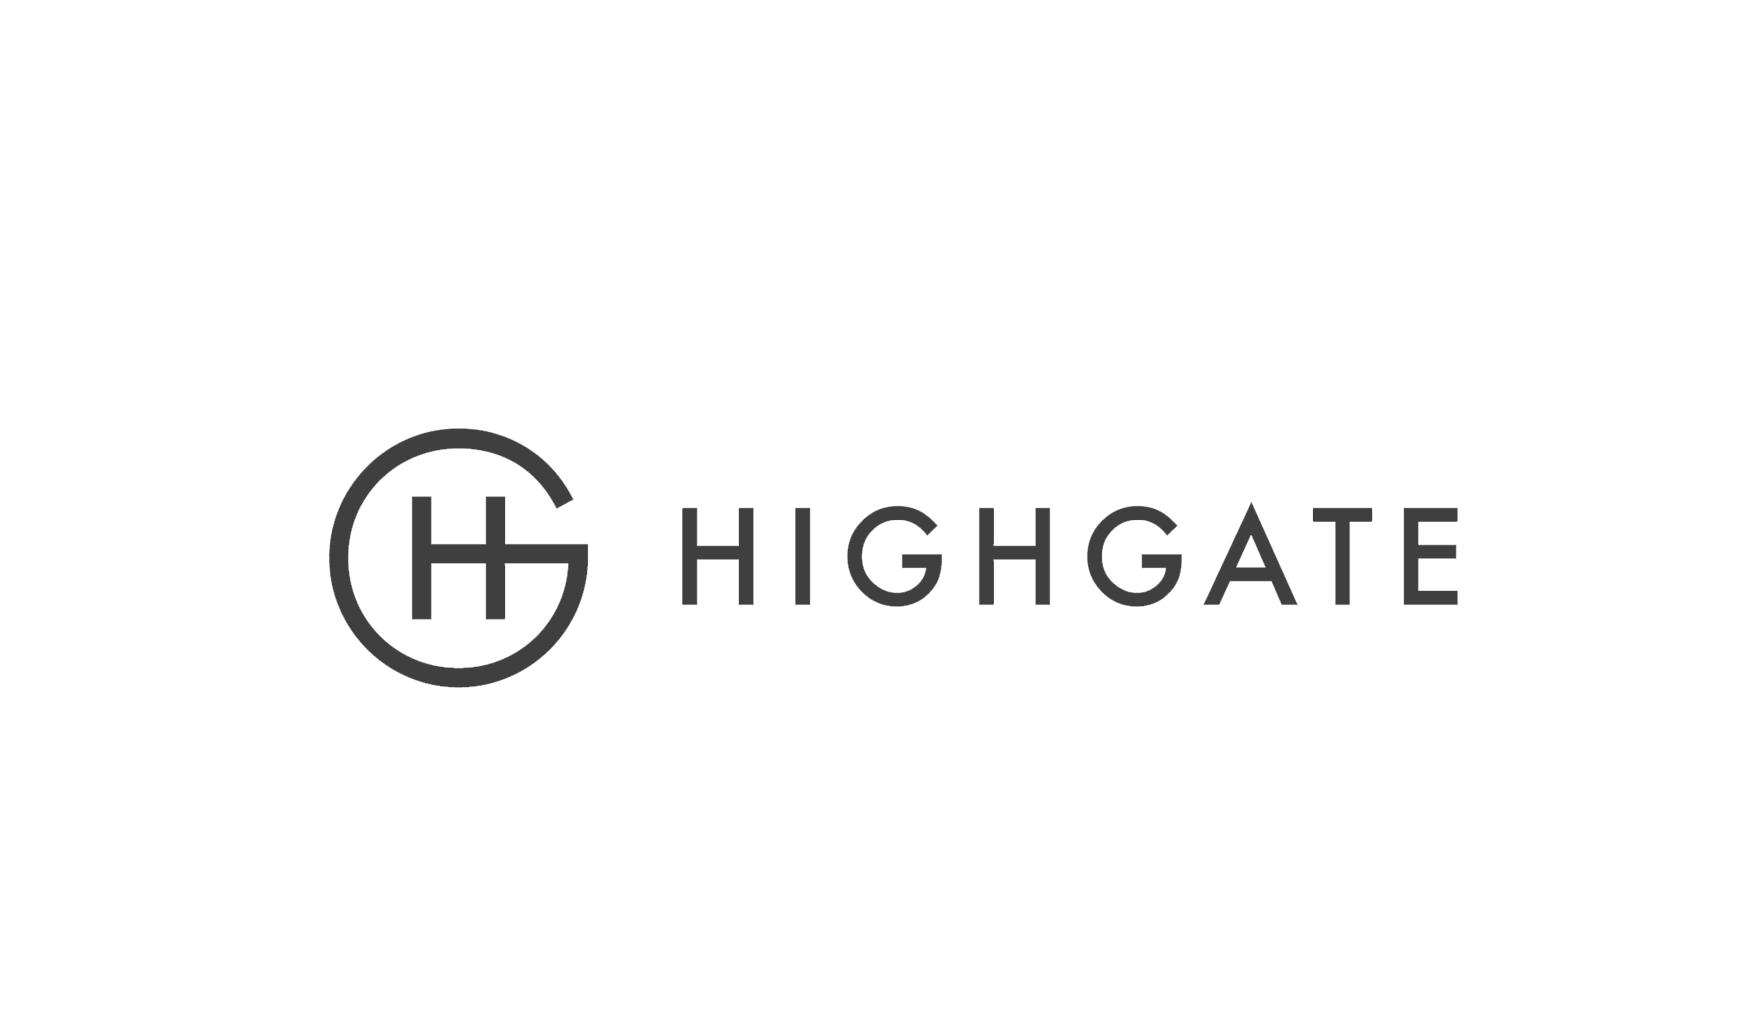 HOTELLOGOS_Layer Comp 9.jpg